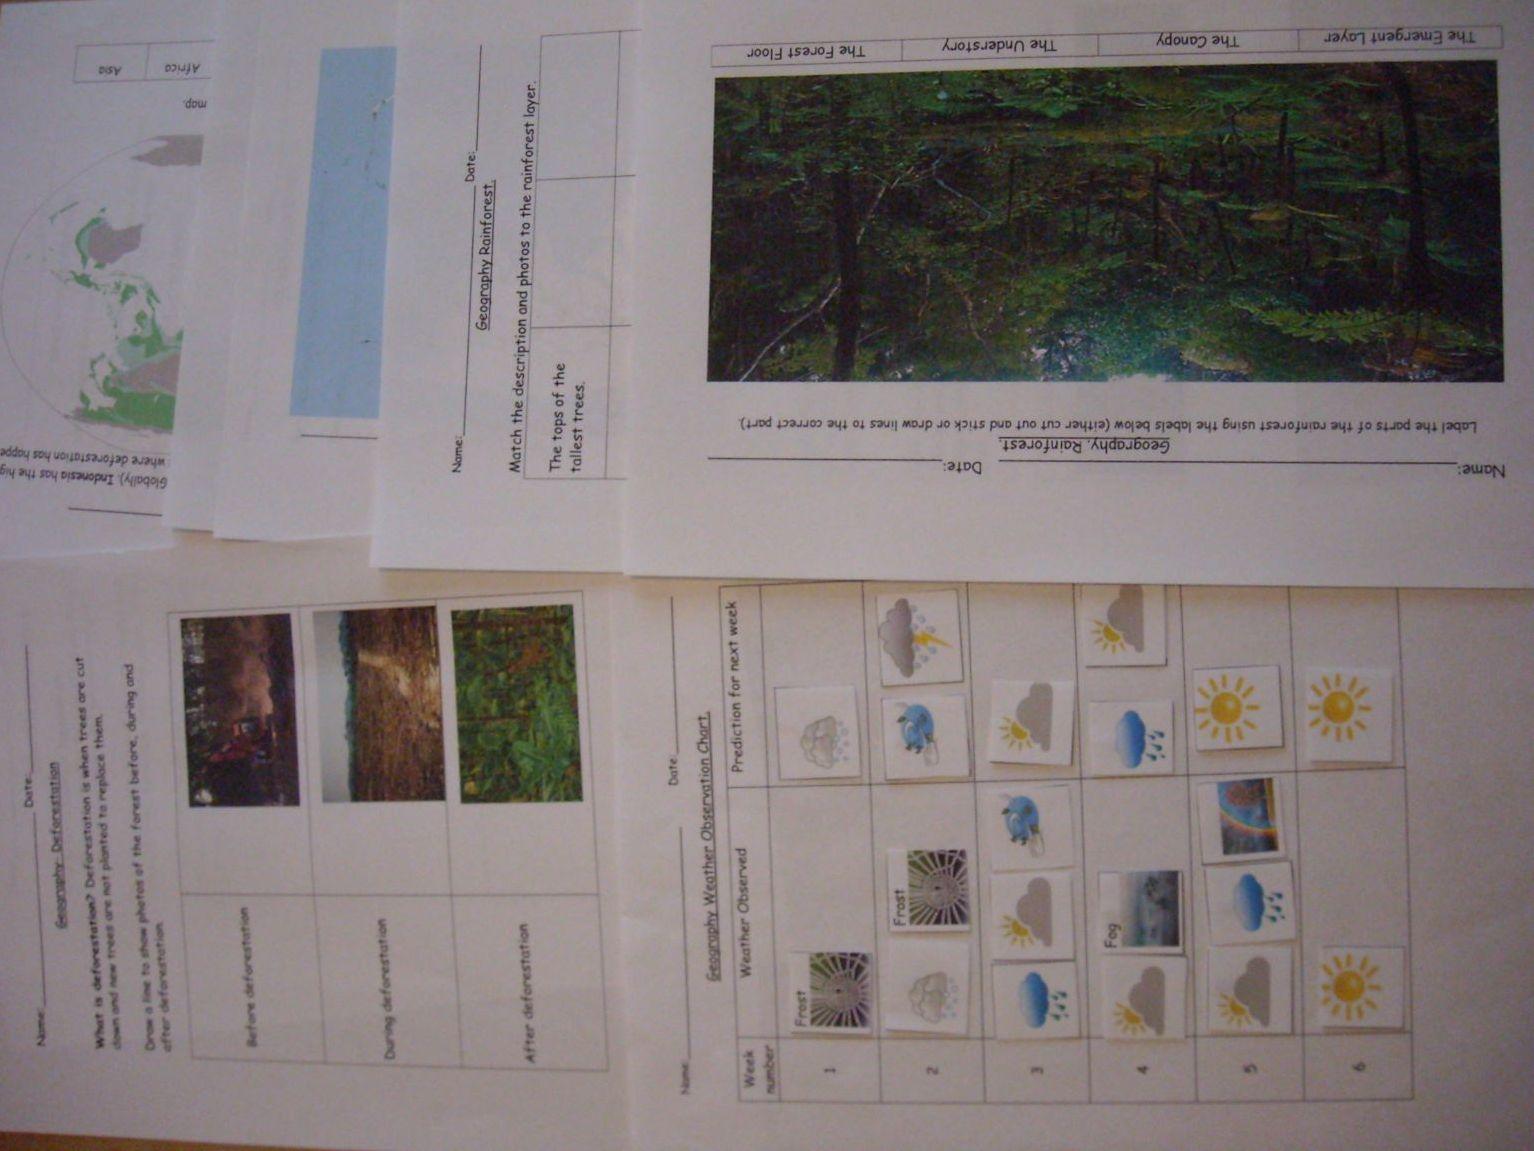 Geography Deforestation Rainforest And Weather Chart Sen